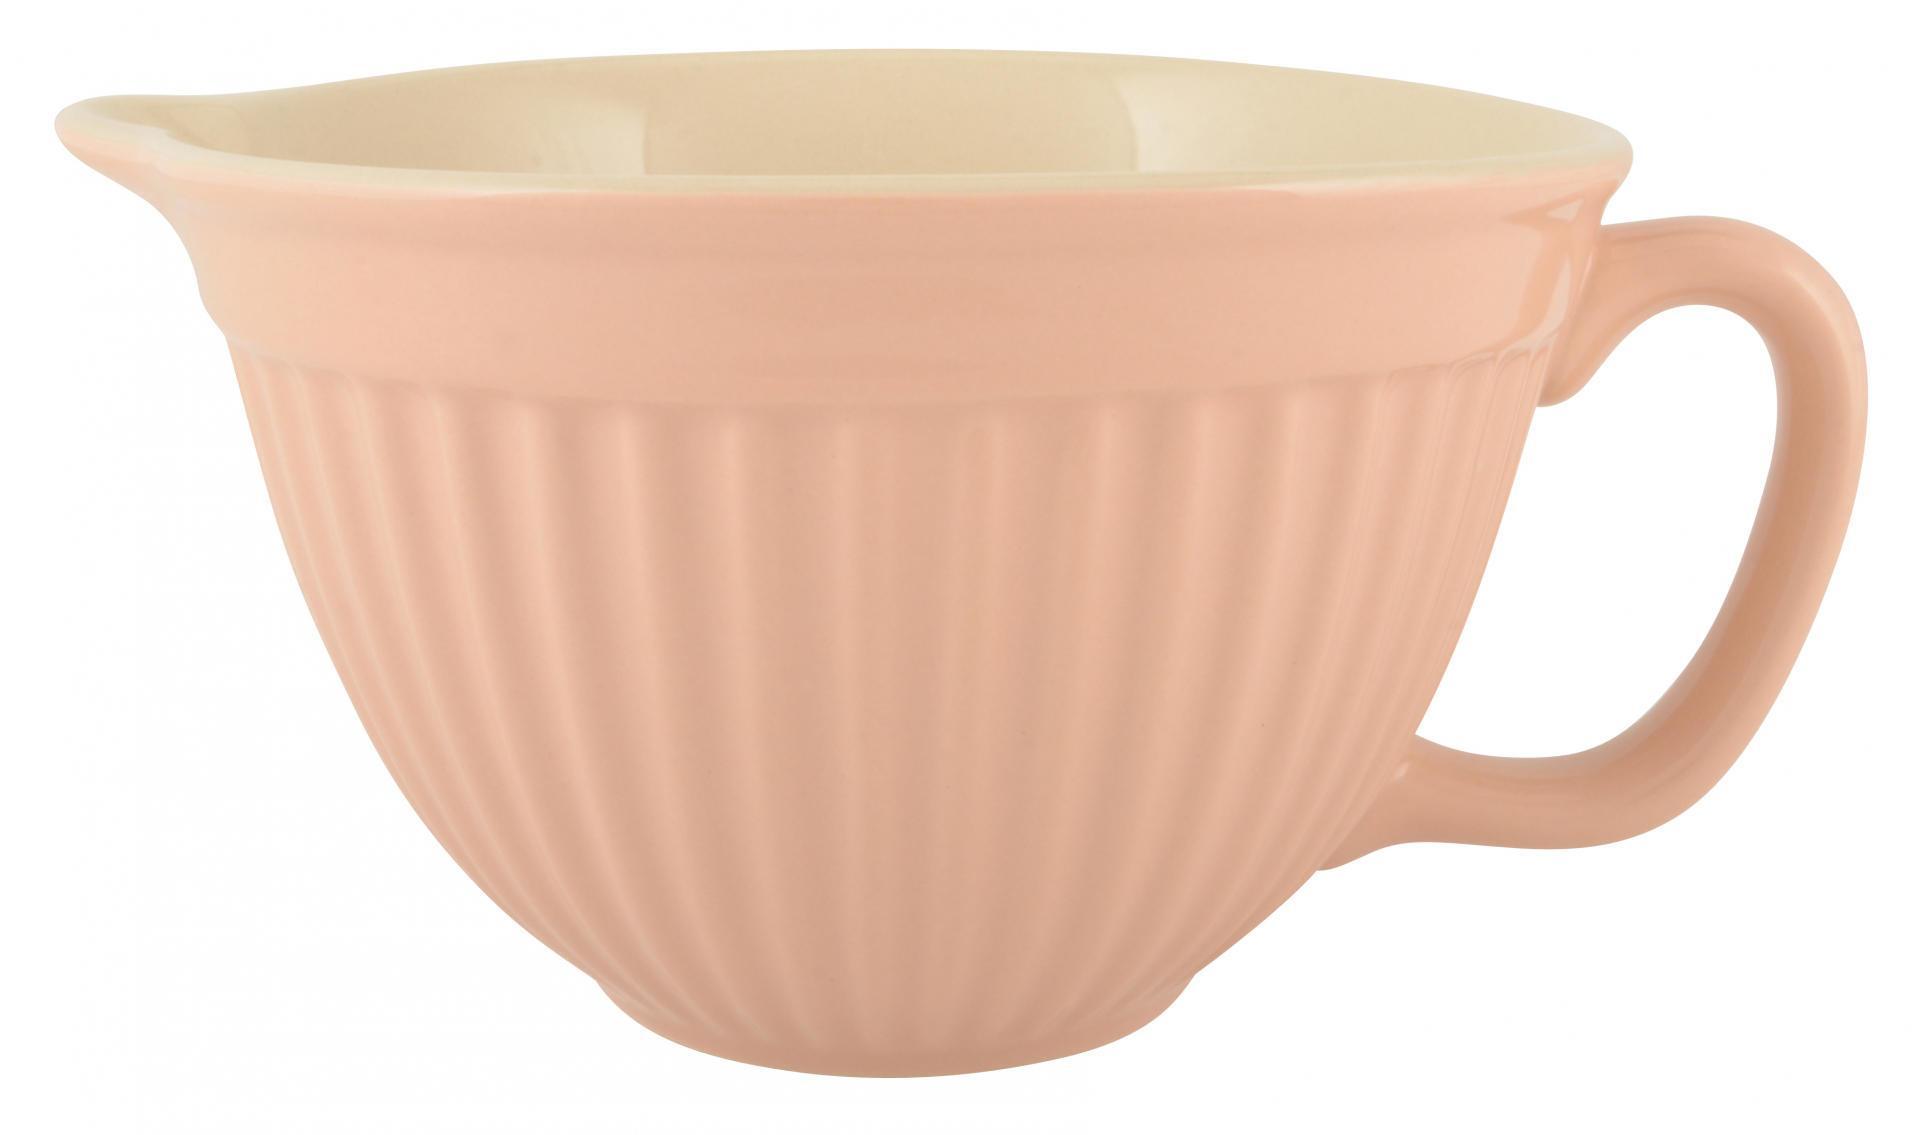 IB LAURSEN Mísa na těsto Mynte Vintage rose, růžová barva, keramika